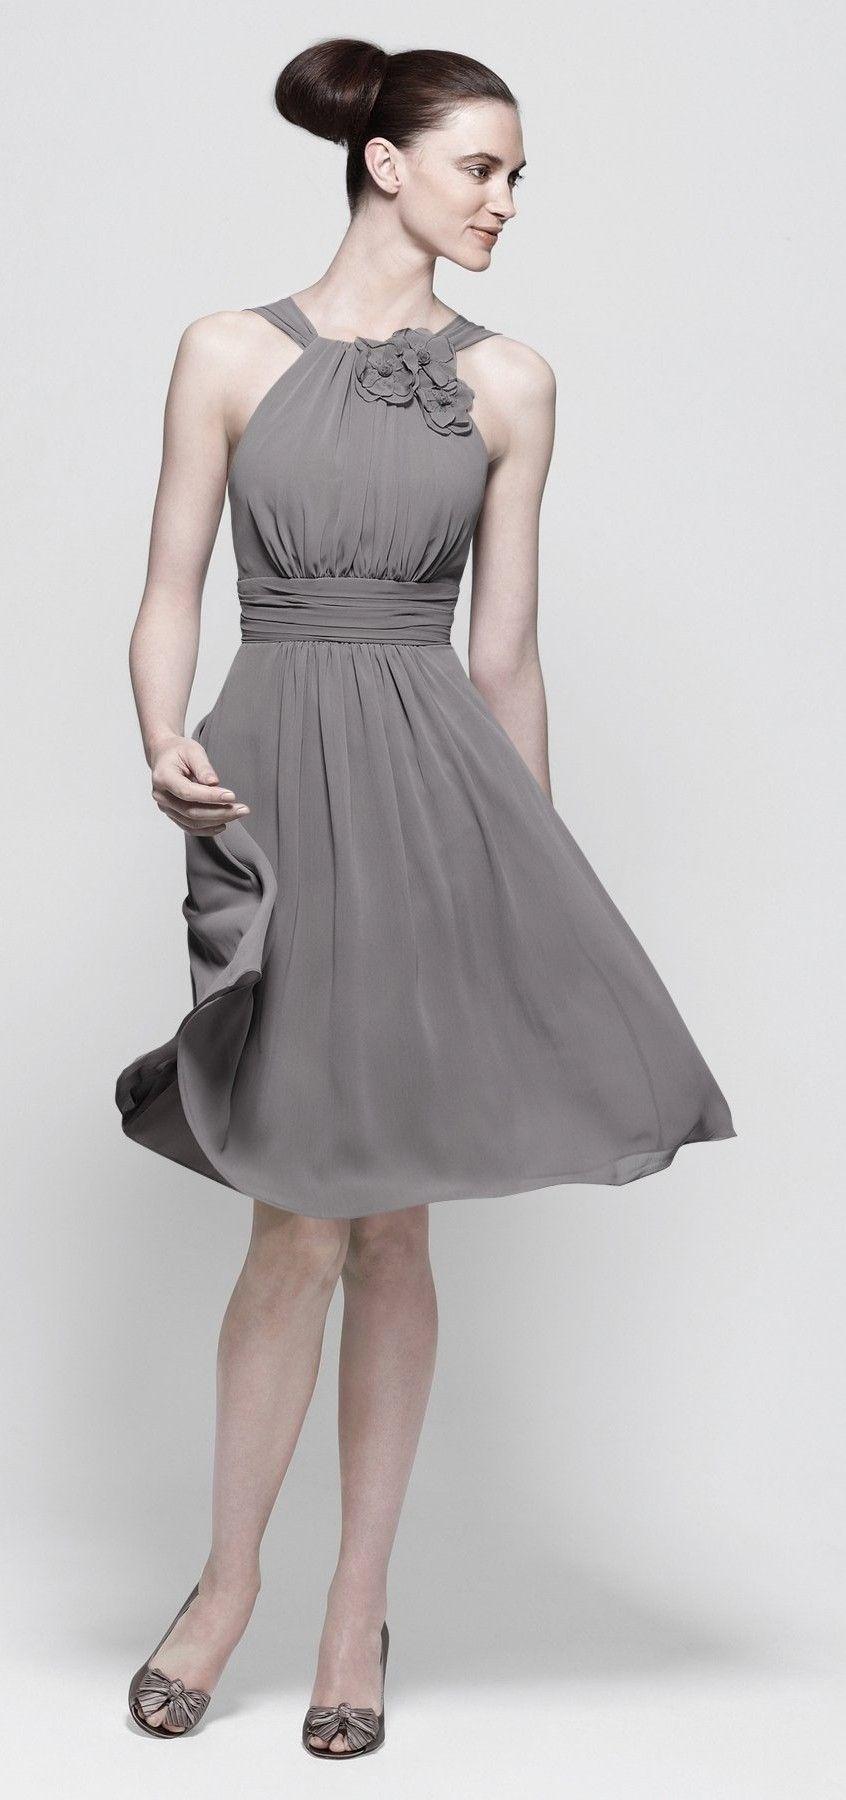 Dark purple wedding dress  oooo can I have this in a pretty dark purple  Wedding day